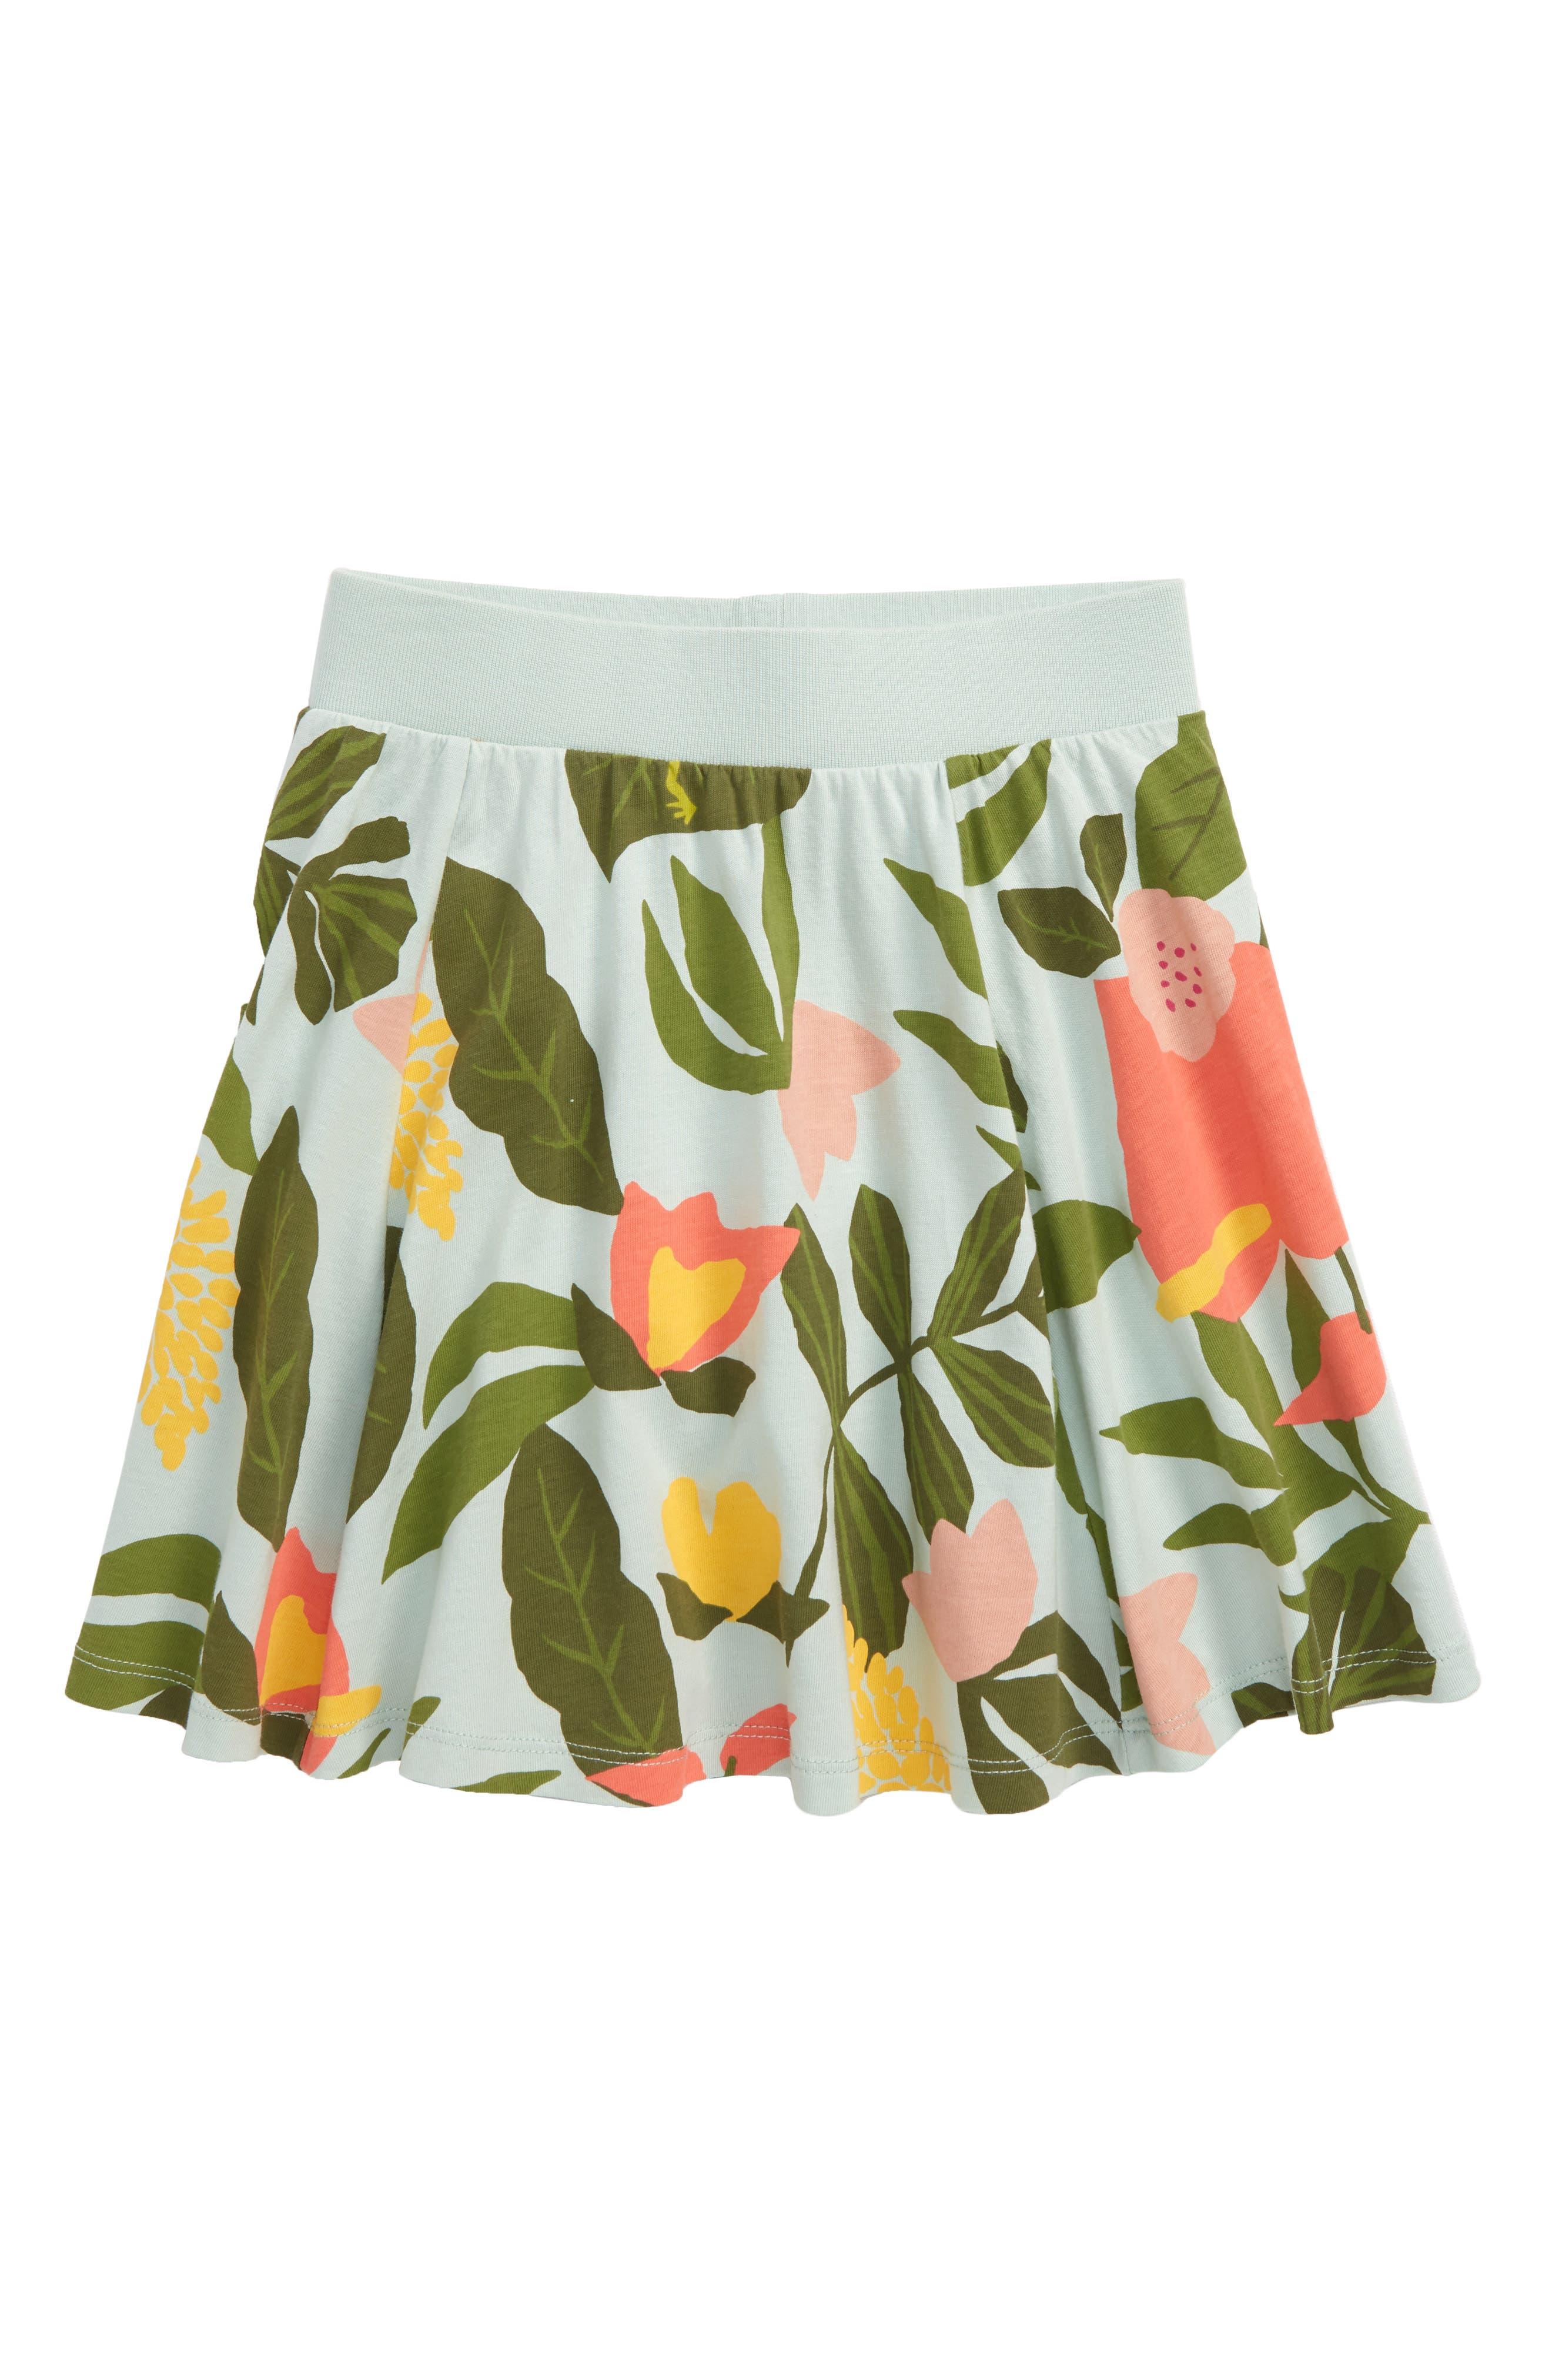 Toddler Girls Tea Collection Print Twirl Skort Size 2T  Green